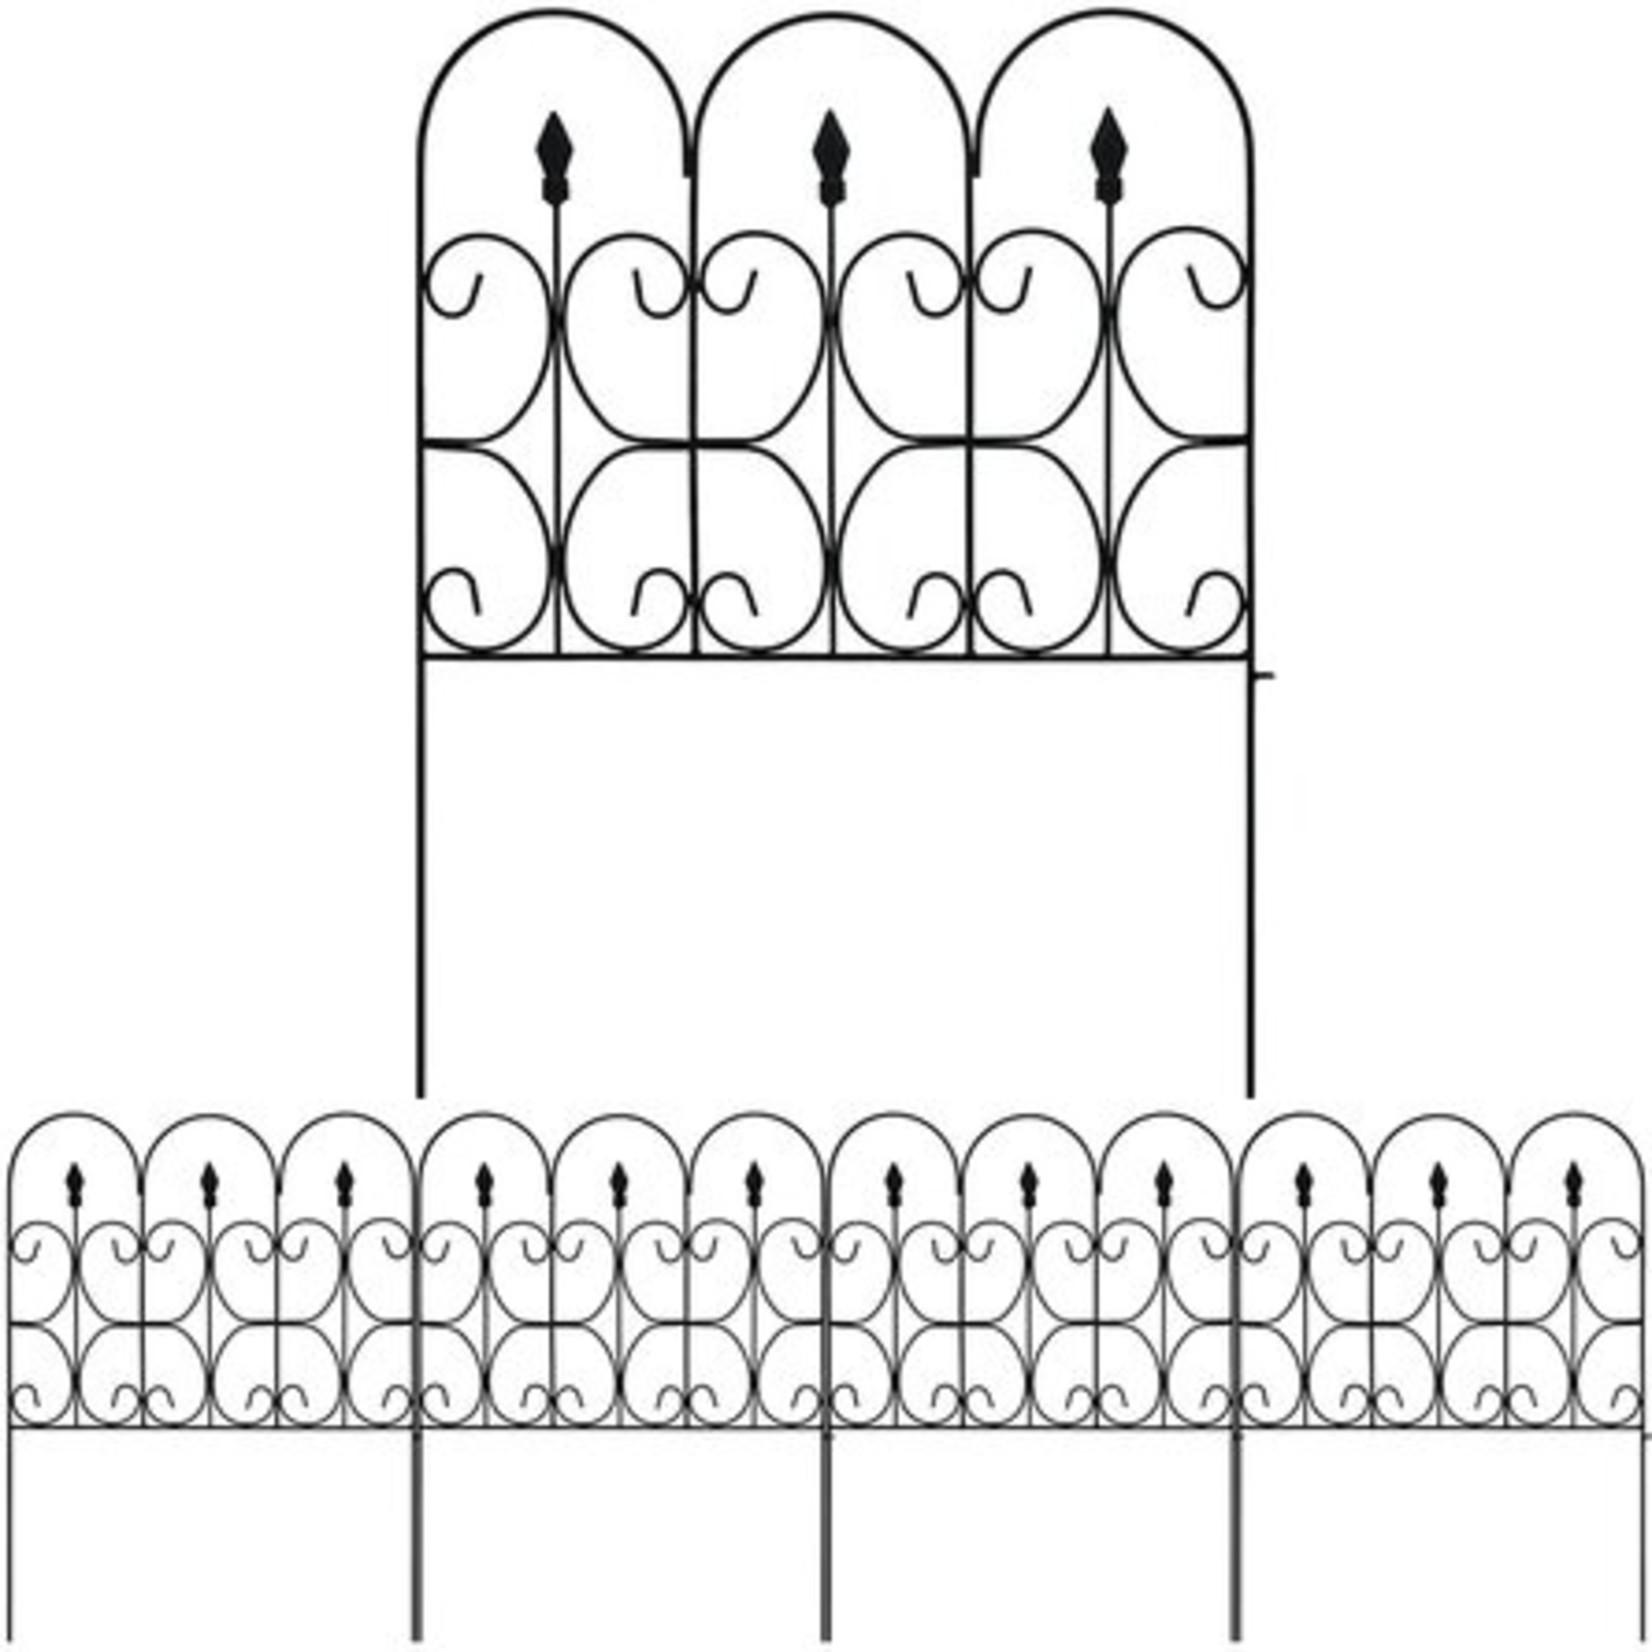 *Decorative Garden Fence Outdoor - 2' X 2' - Set of 5